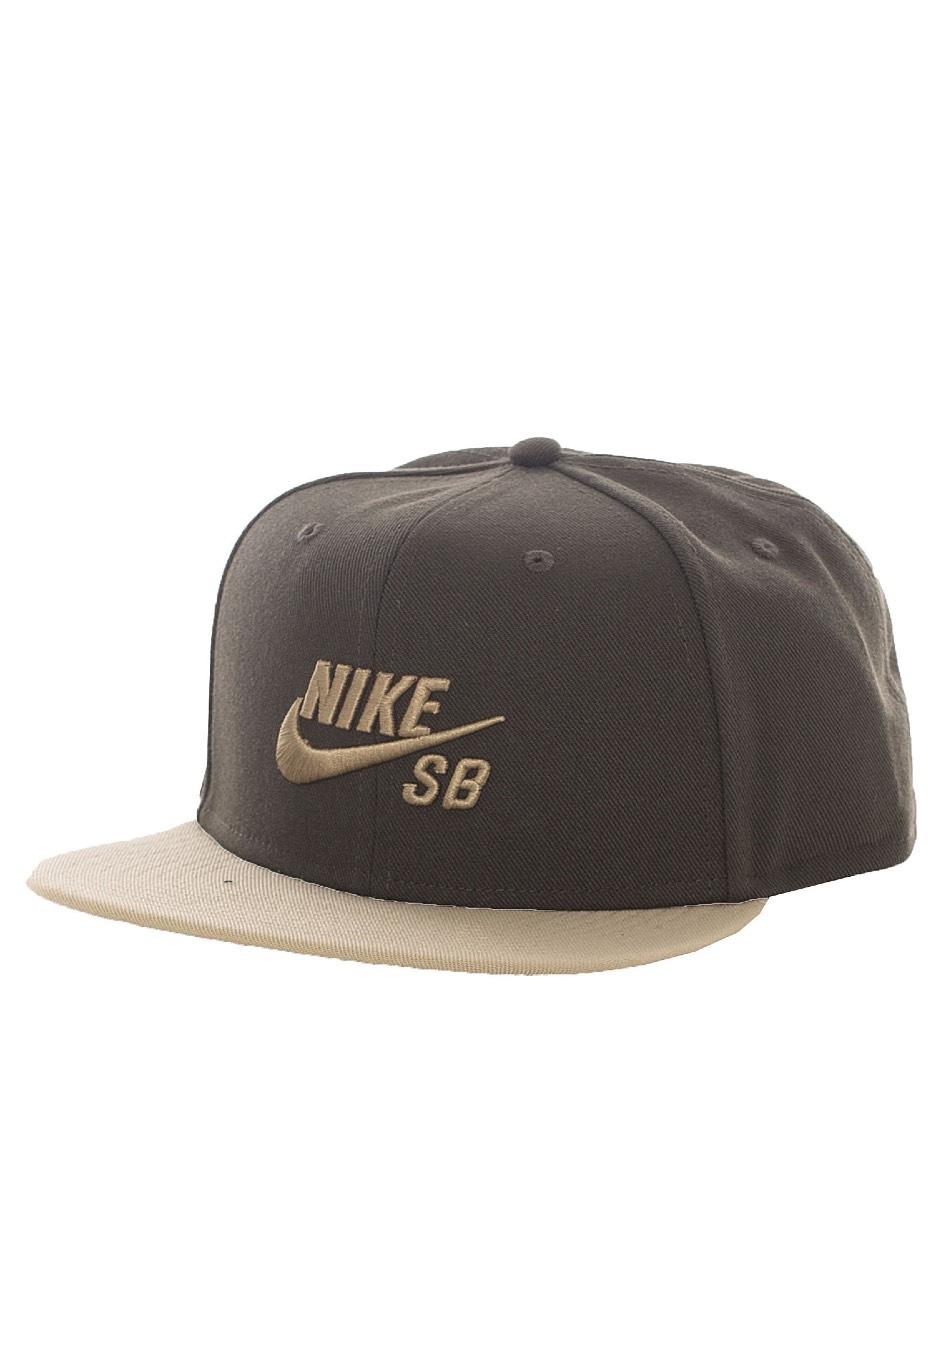 cdc50b167 Nike - SB Pro Sequoia/Neutral Olive/Neutral Olive - Cap